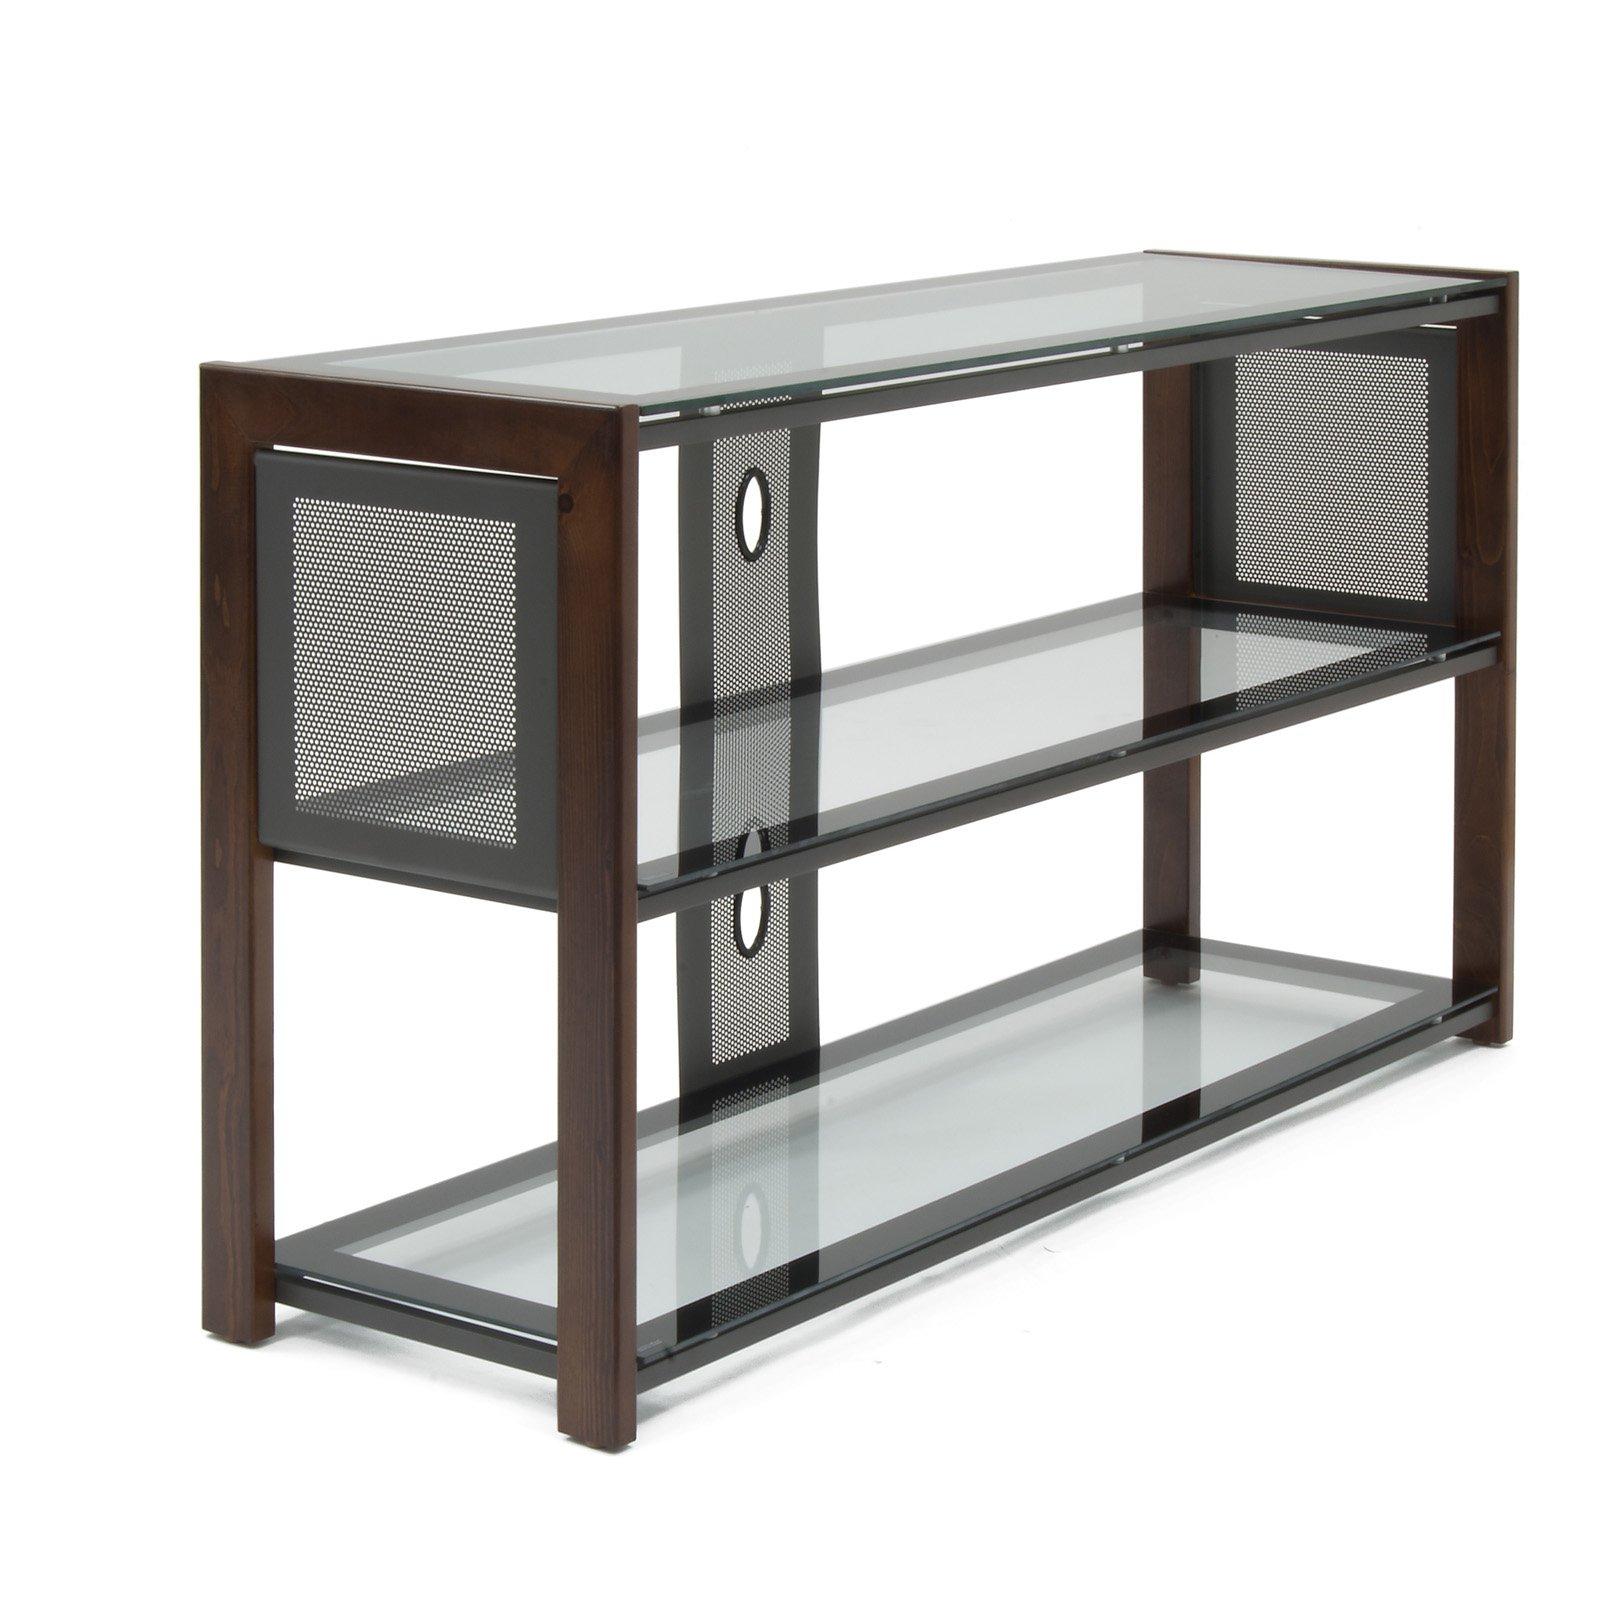 Calico Designs Office Line TV Stand - Sonoma Brown